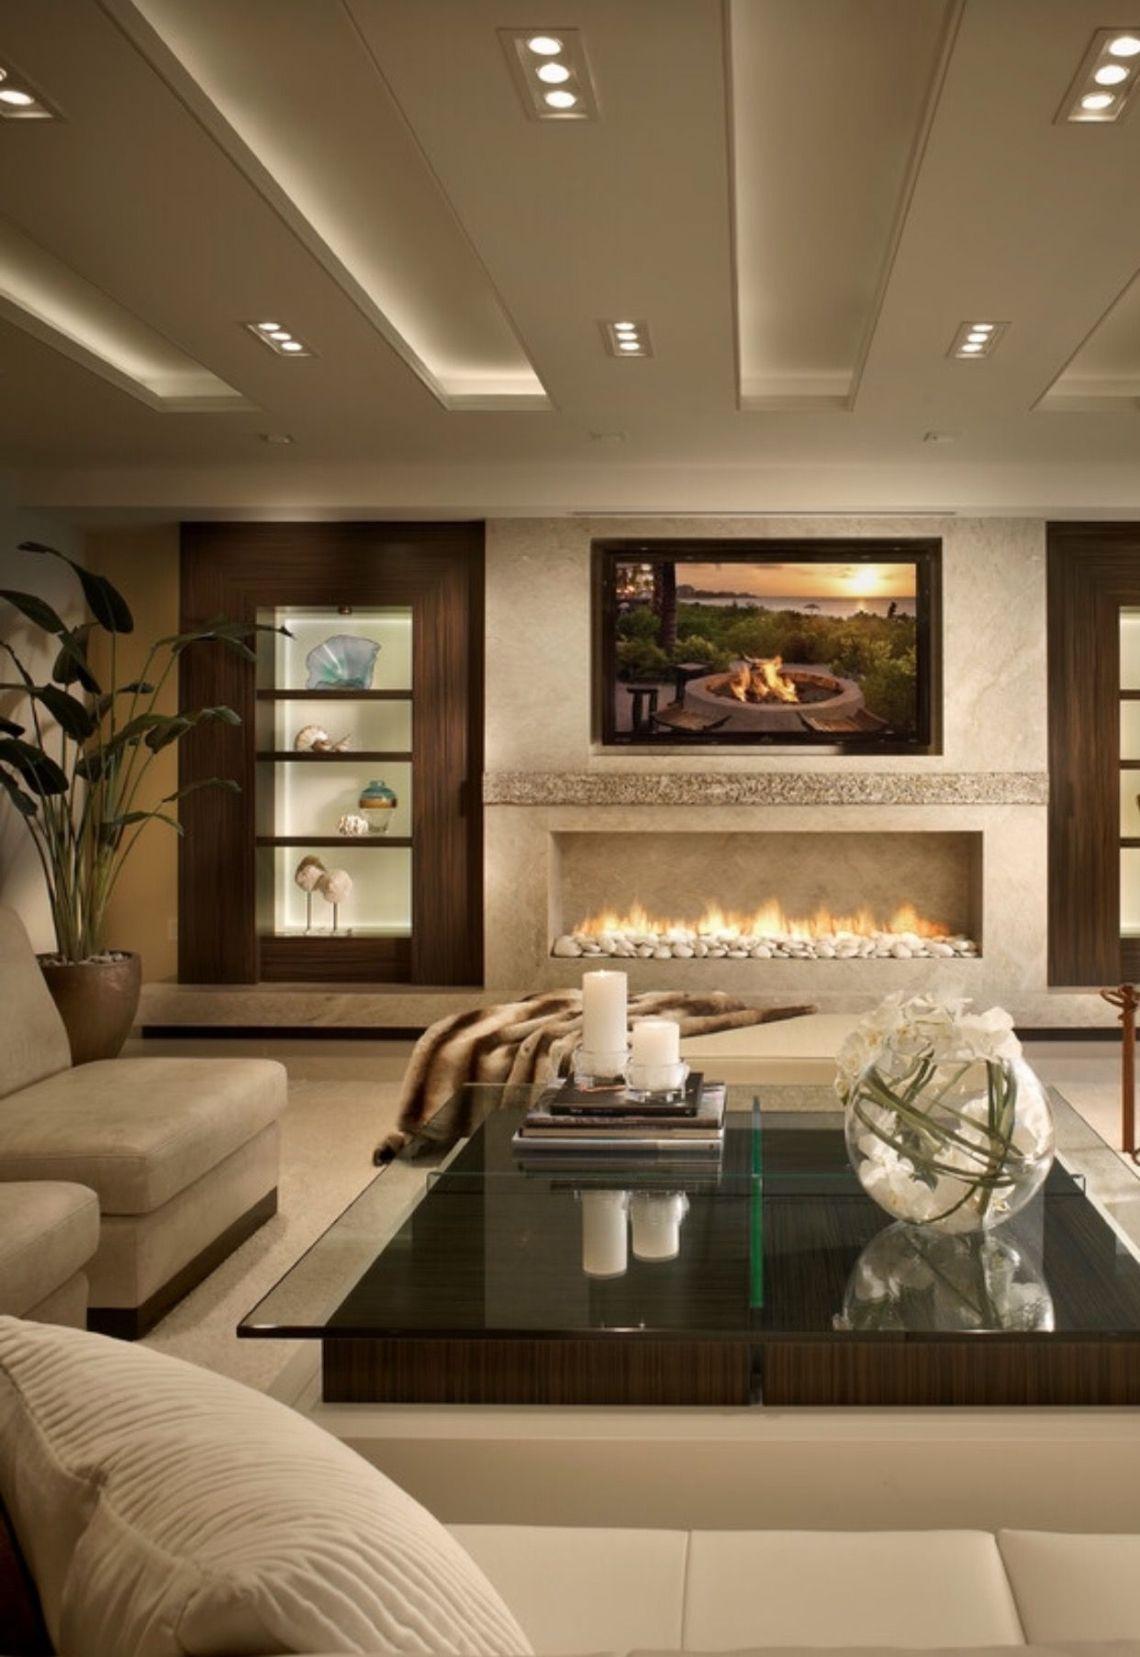 Linear fireplace | Design | Pinterest | Linear fireplace ...